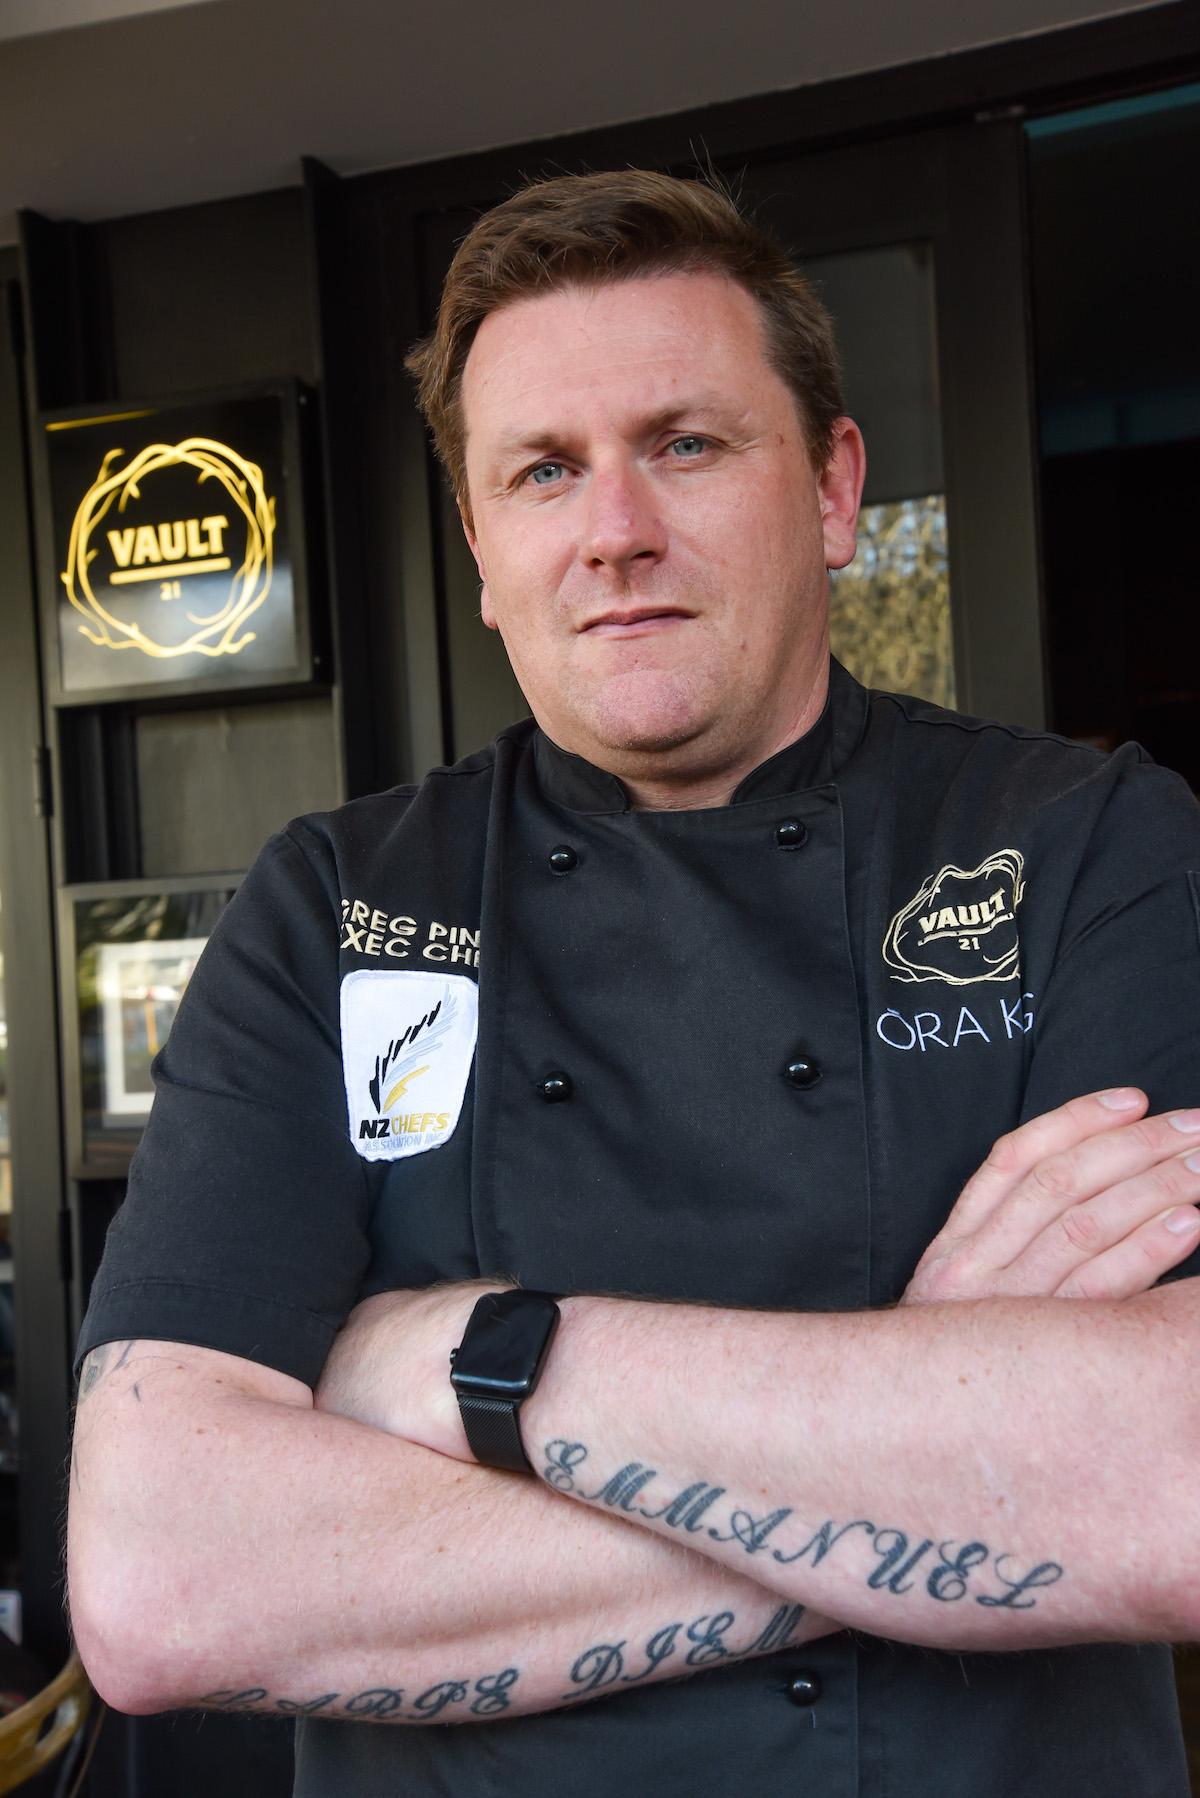 Vault 21 chef Greg Piner